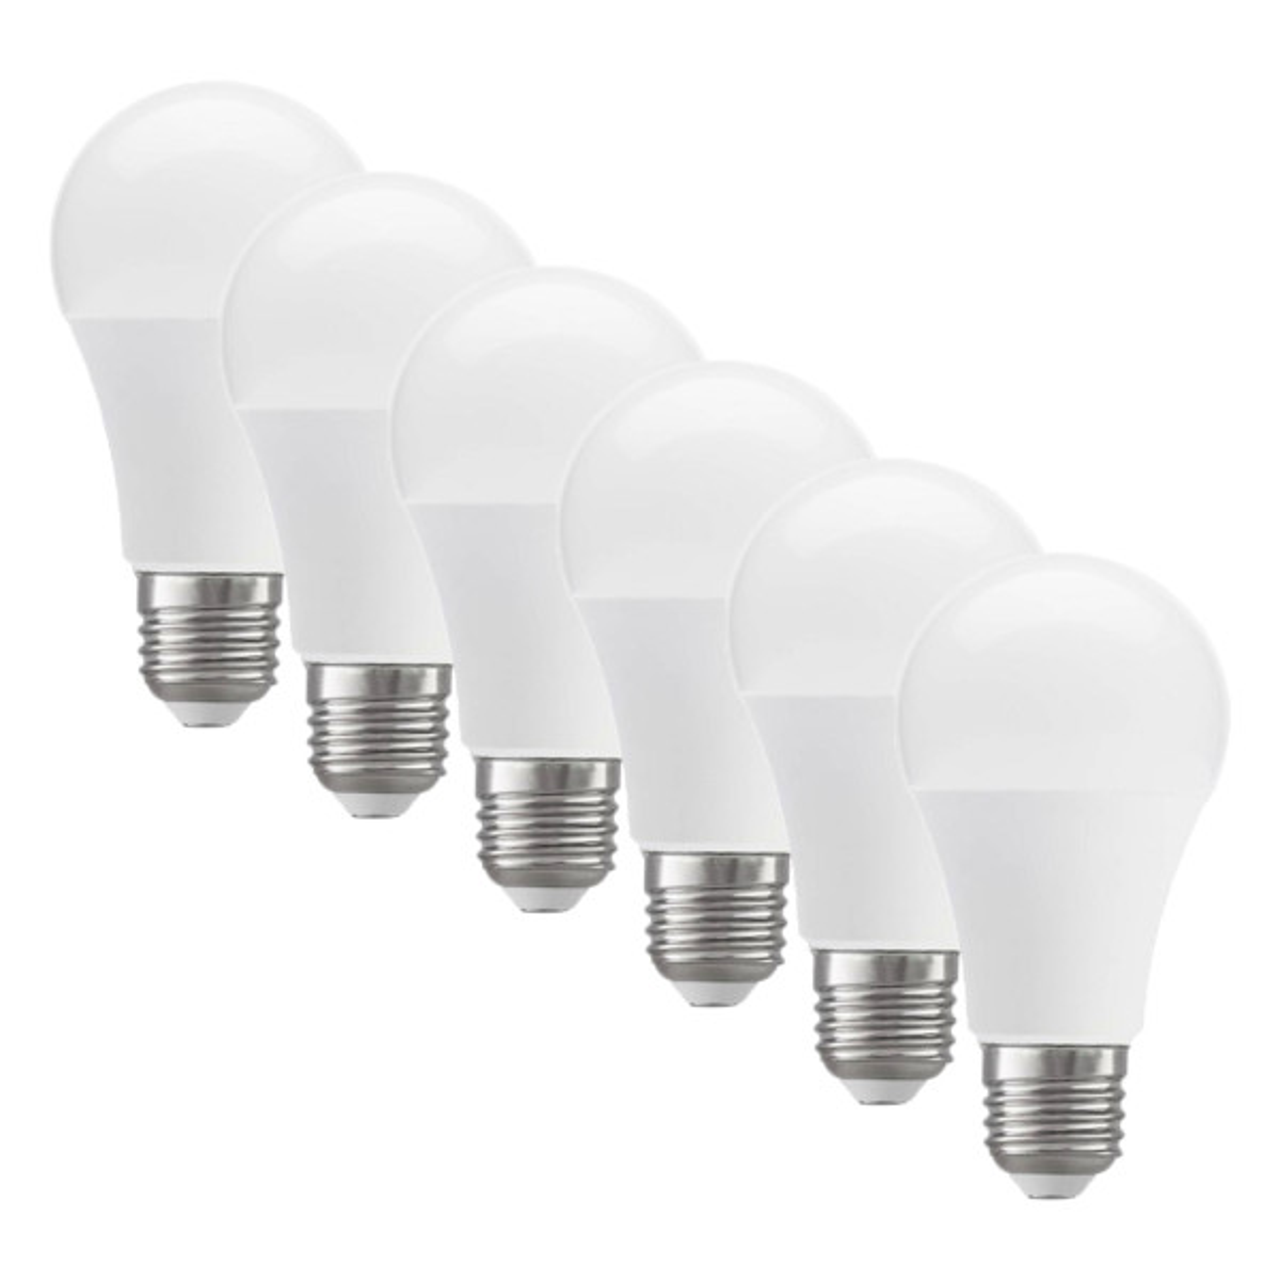 لامپ ال ای دی 12 وات مونلایت پایه E27 بسته 6 عددی